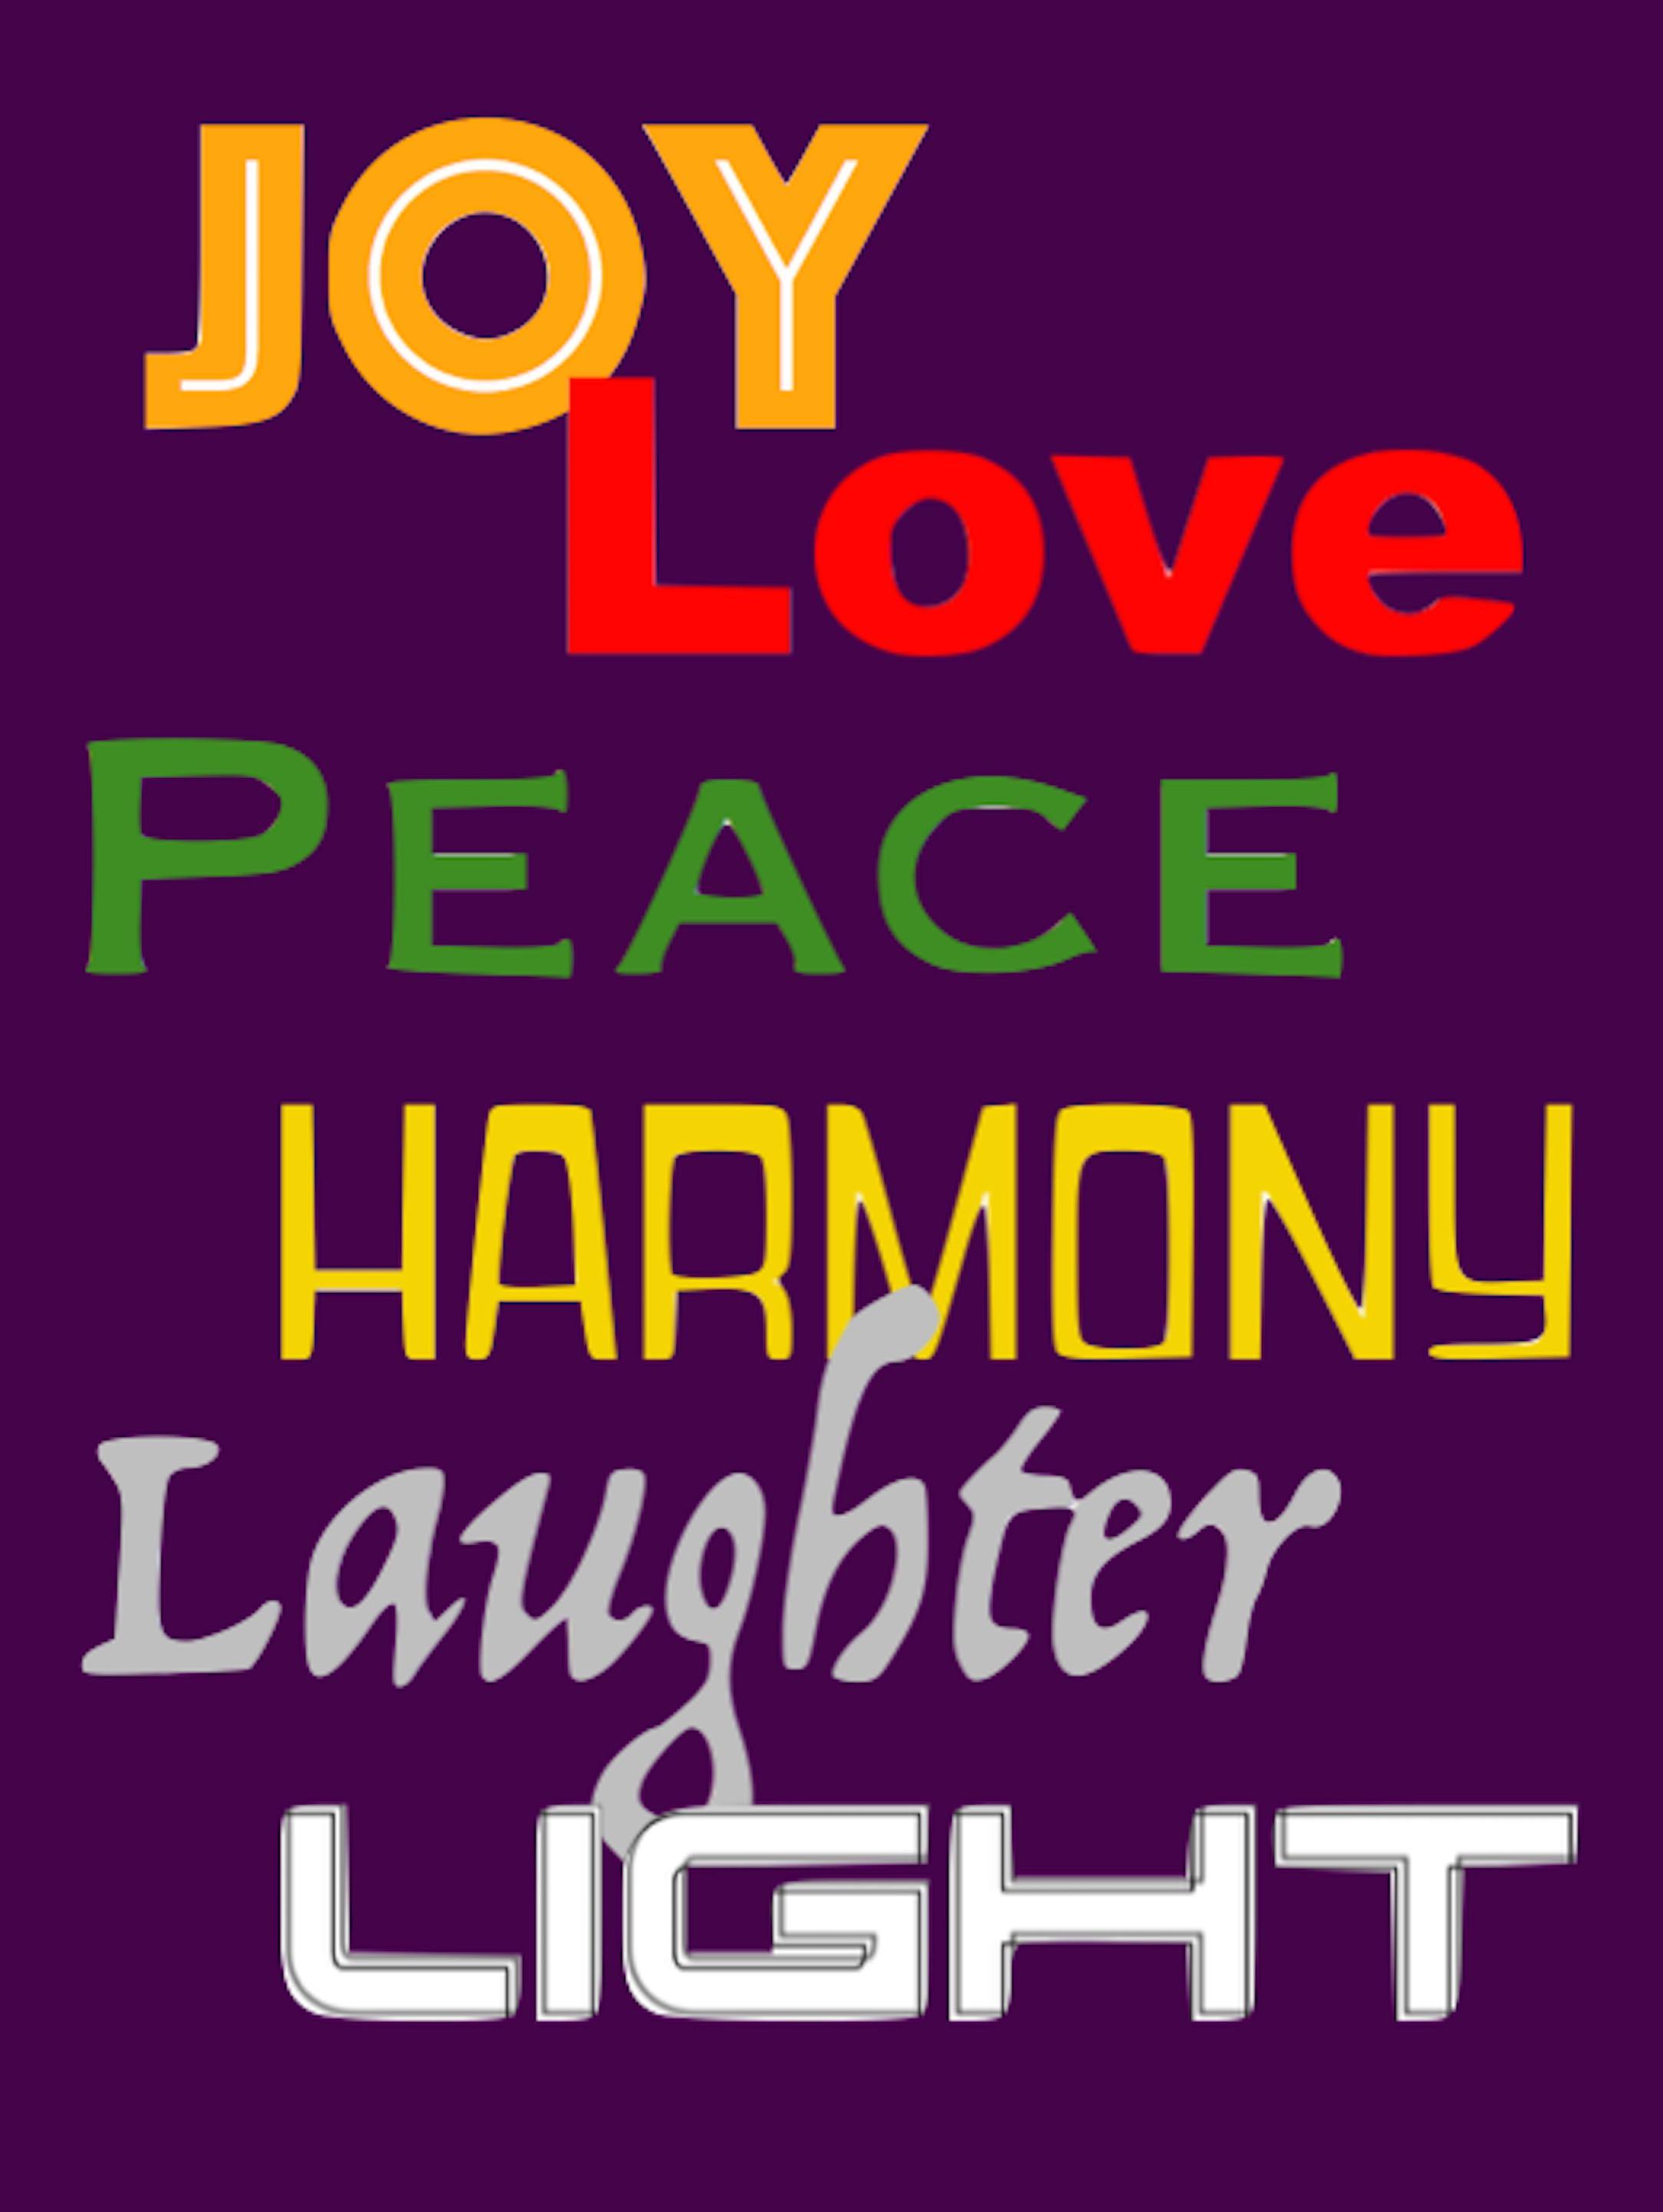 Joy Love Peace Harmony Laughter Light